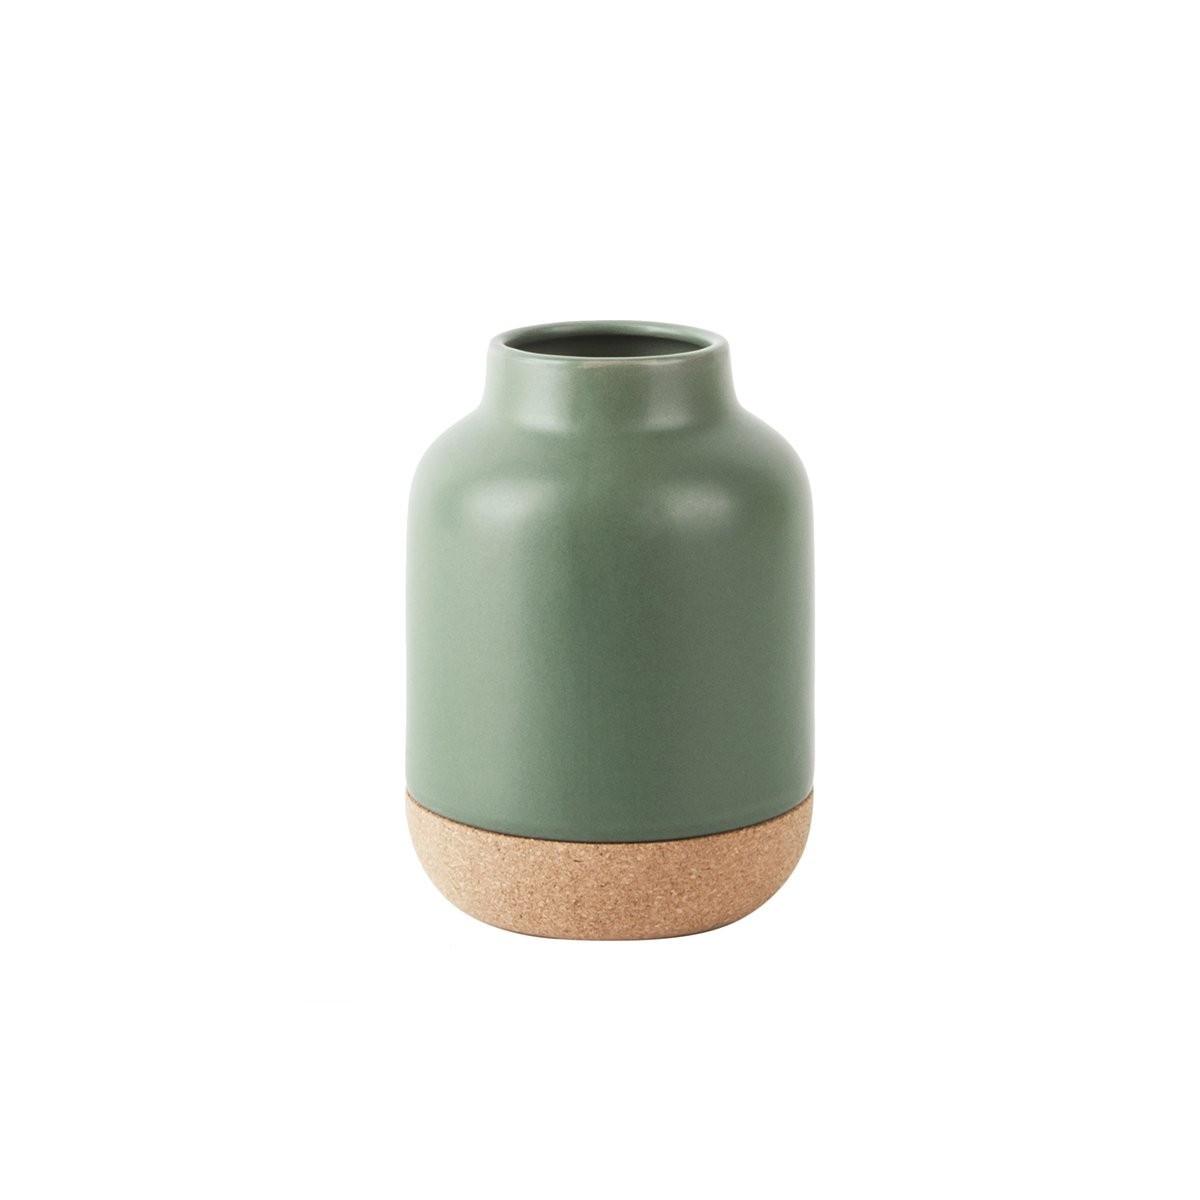 Sada 2 ks − Váza Craft malá – zelená Present Time